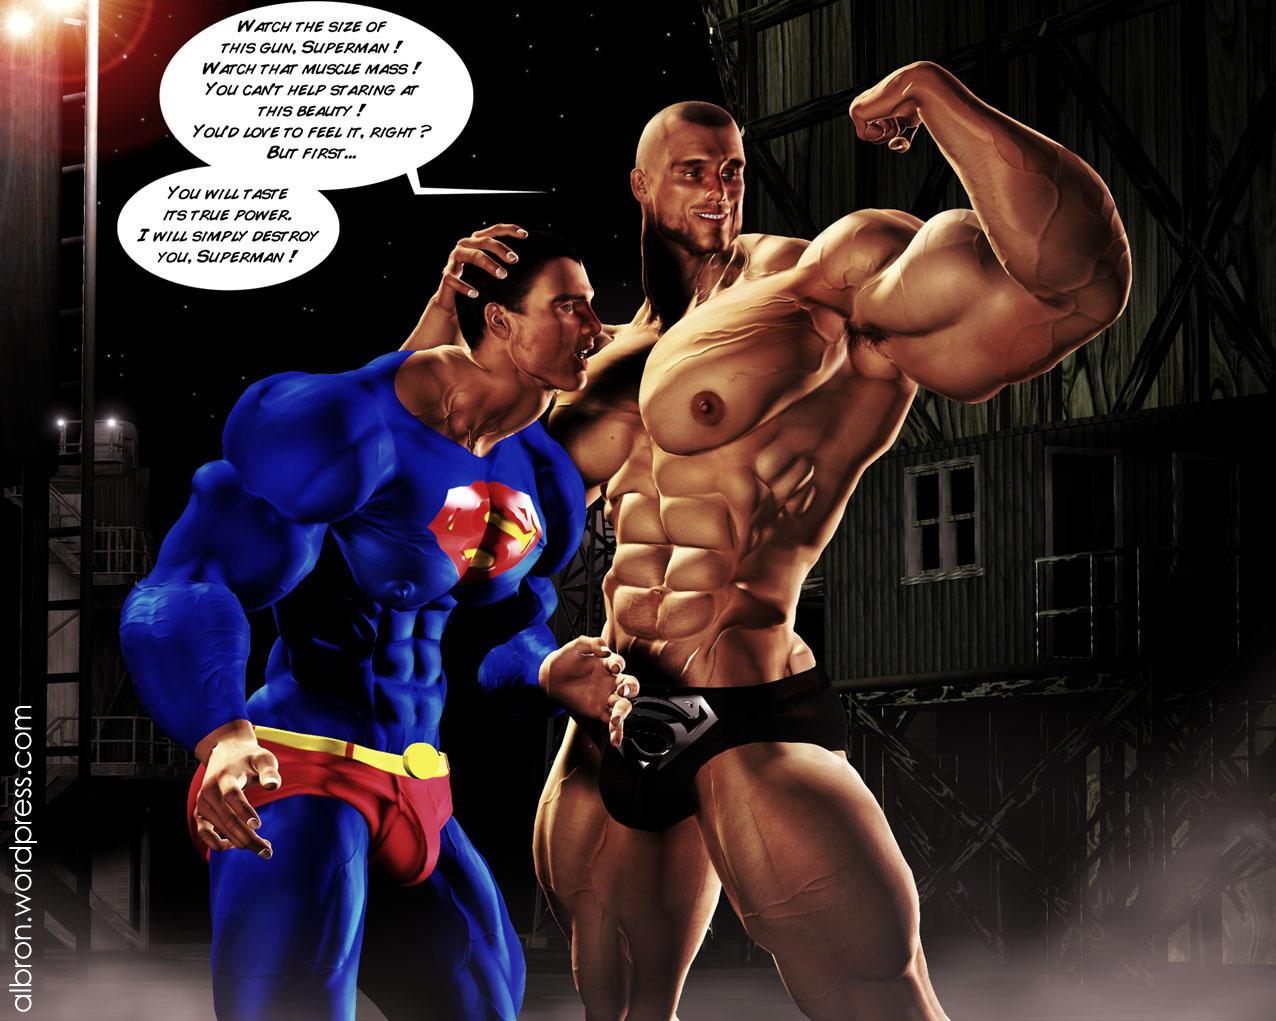 edmonton gay wrestling